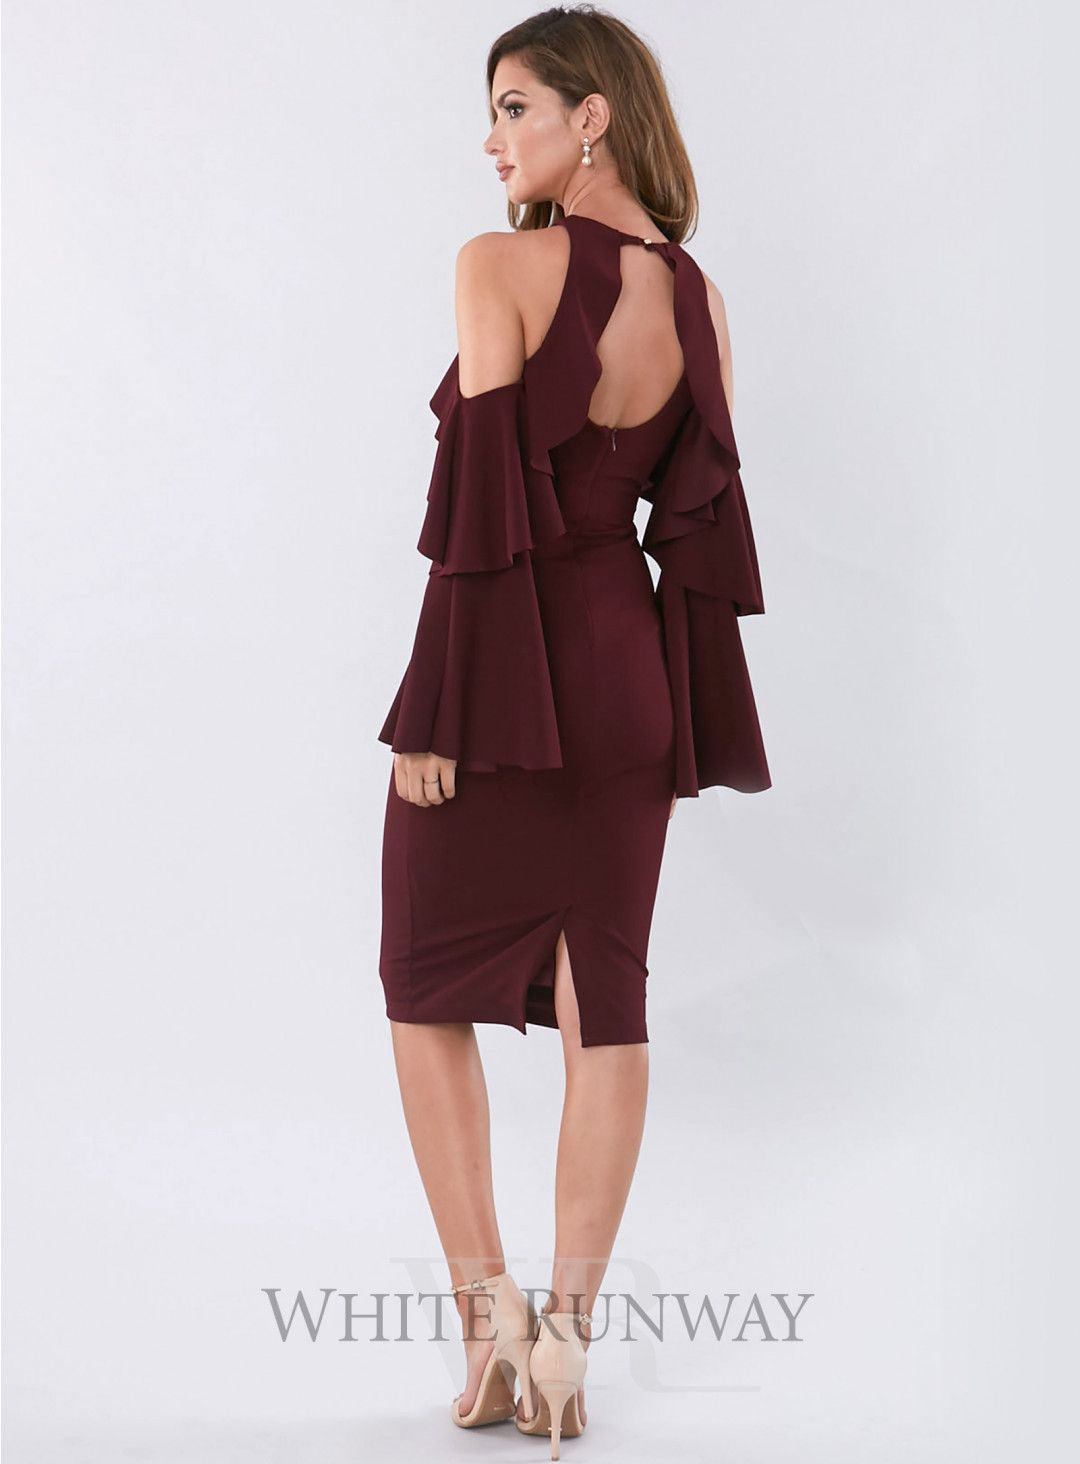 Celine Midi. A stylish midi dress by Pasduchas. A high neck style ...